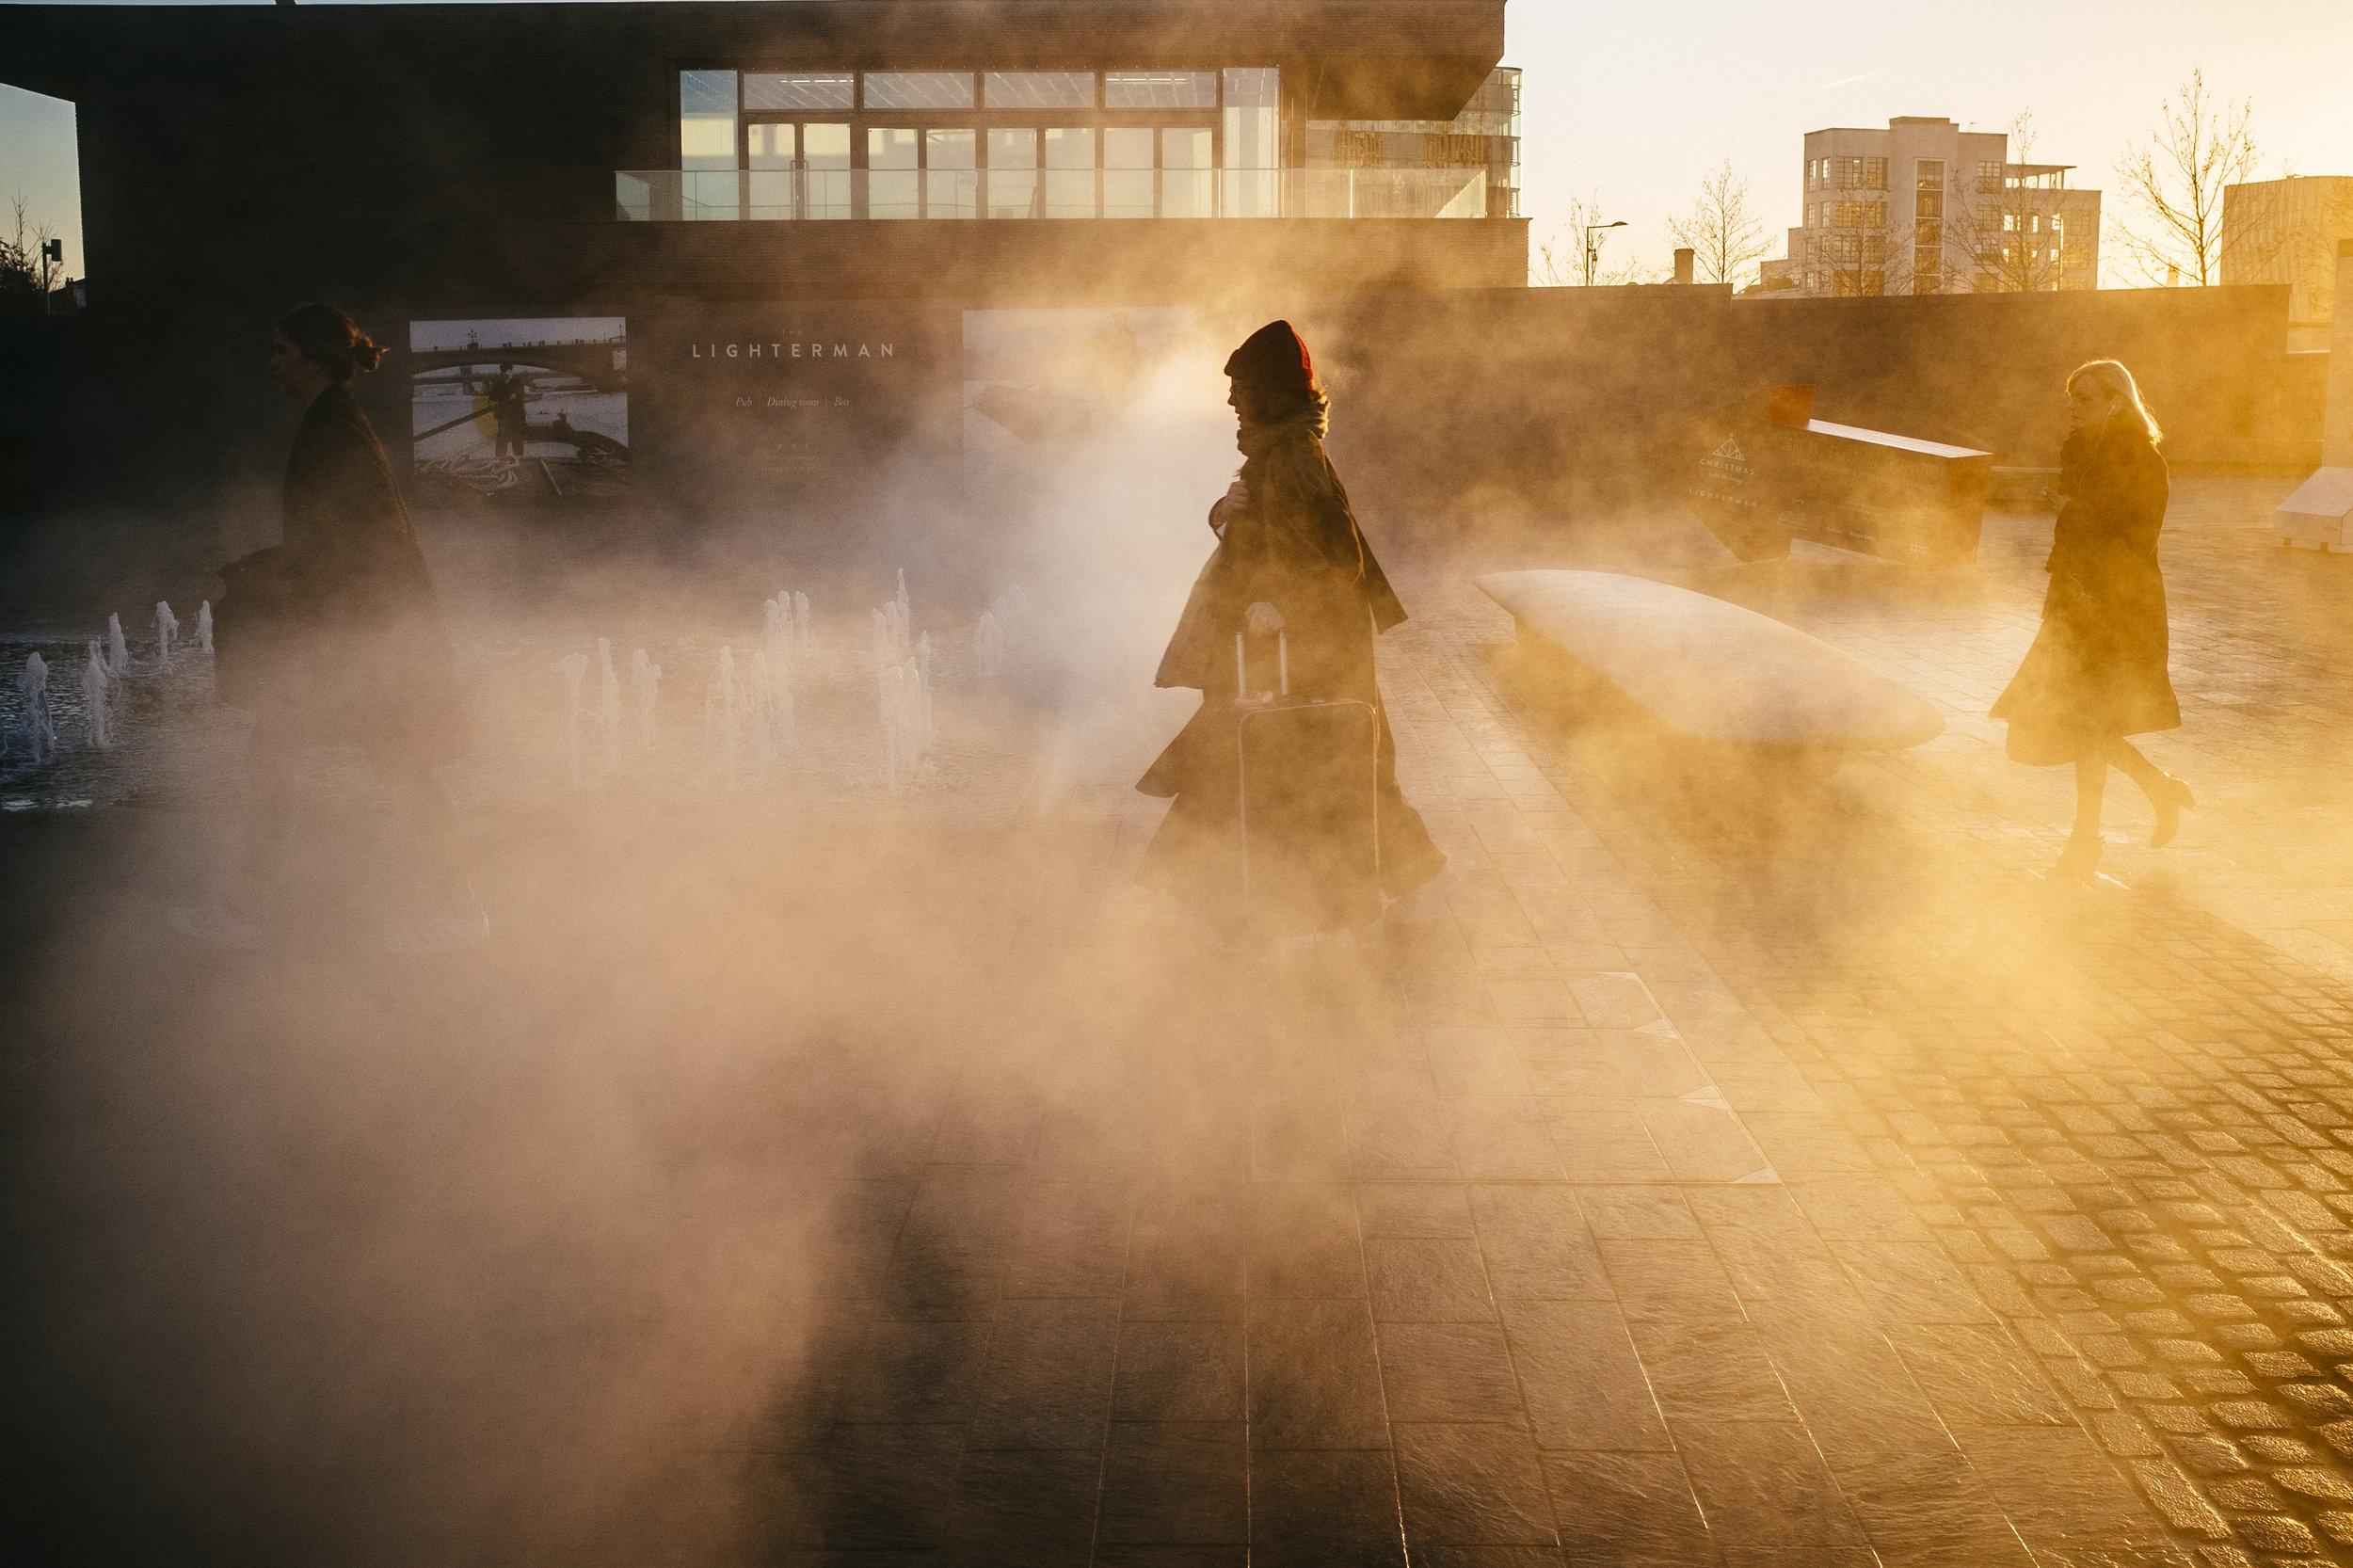 Pedestrians walks through steam rising from a fountain on Granary Square, near King's Cross, London, Wednesday, Dec. 9, 2015.